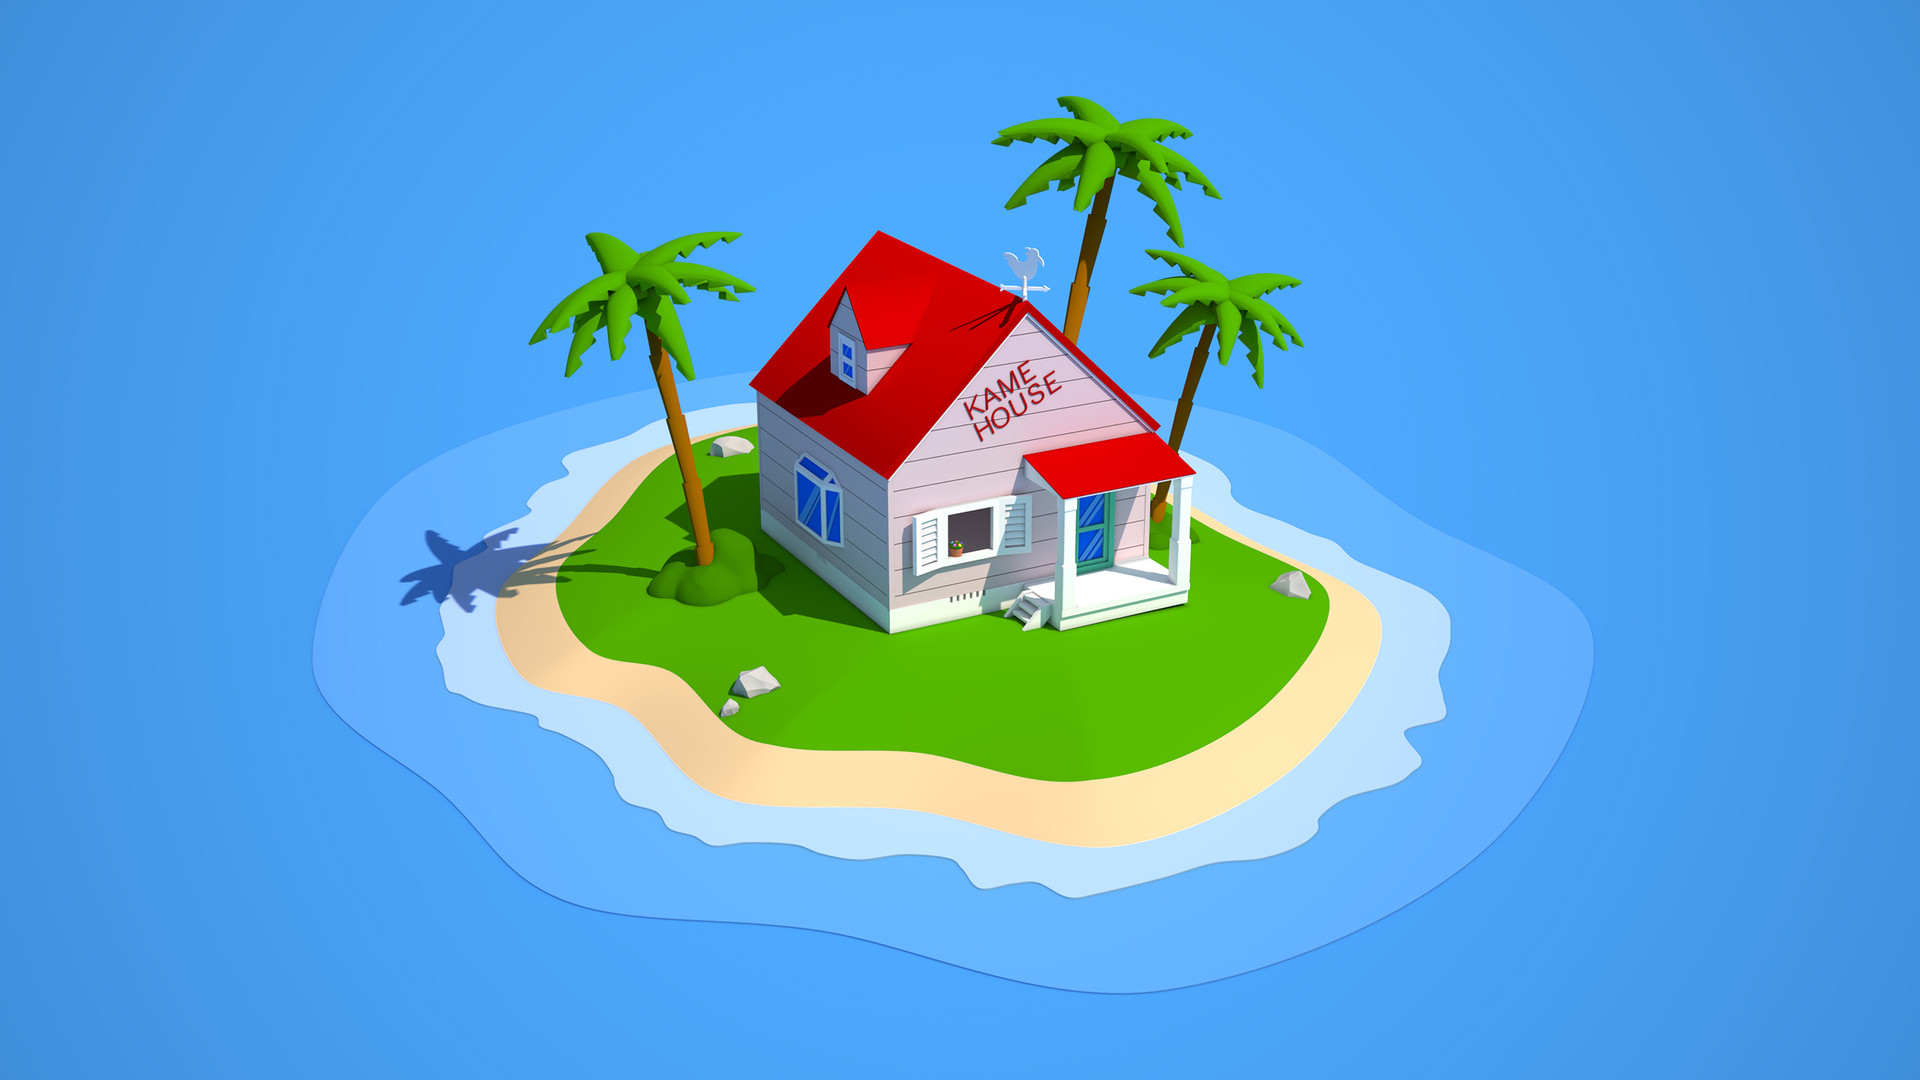 artstation dragon ball kame house nicolas oberson. Black Bedroom Furniture Sets. Home Design Ideas